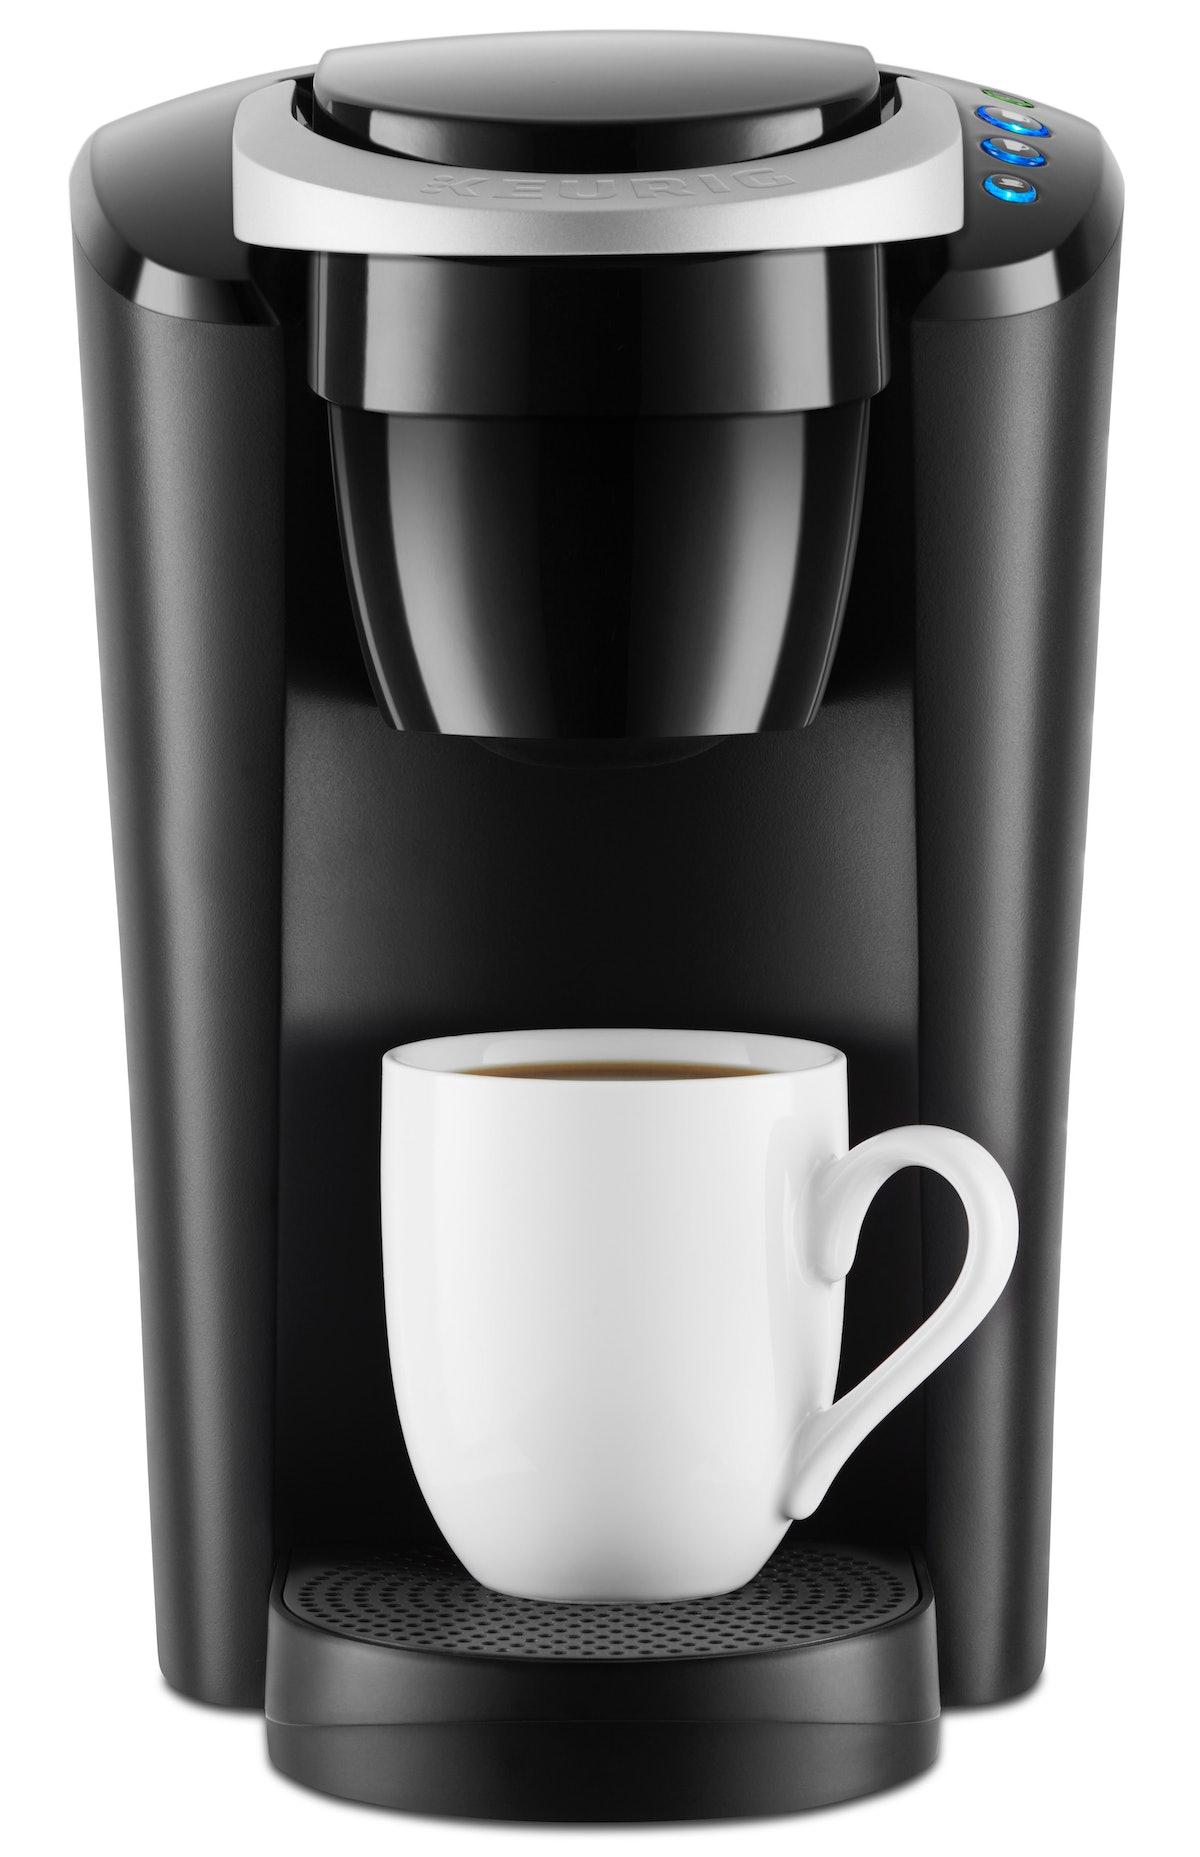 K-Compact Single-Serve K-Cup Pod Coffee Maker